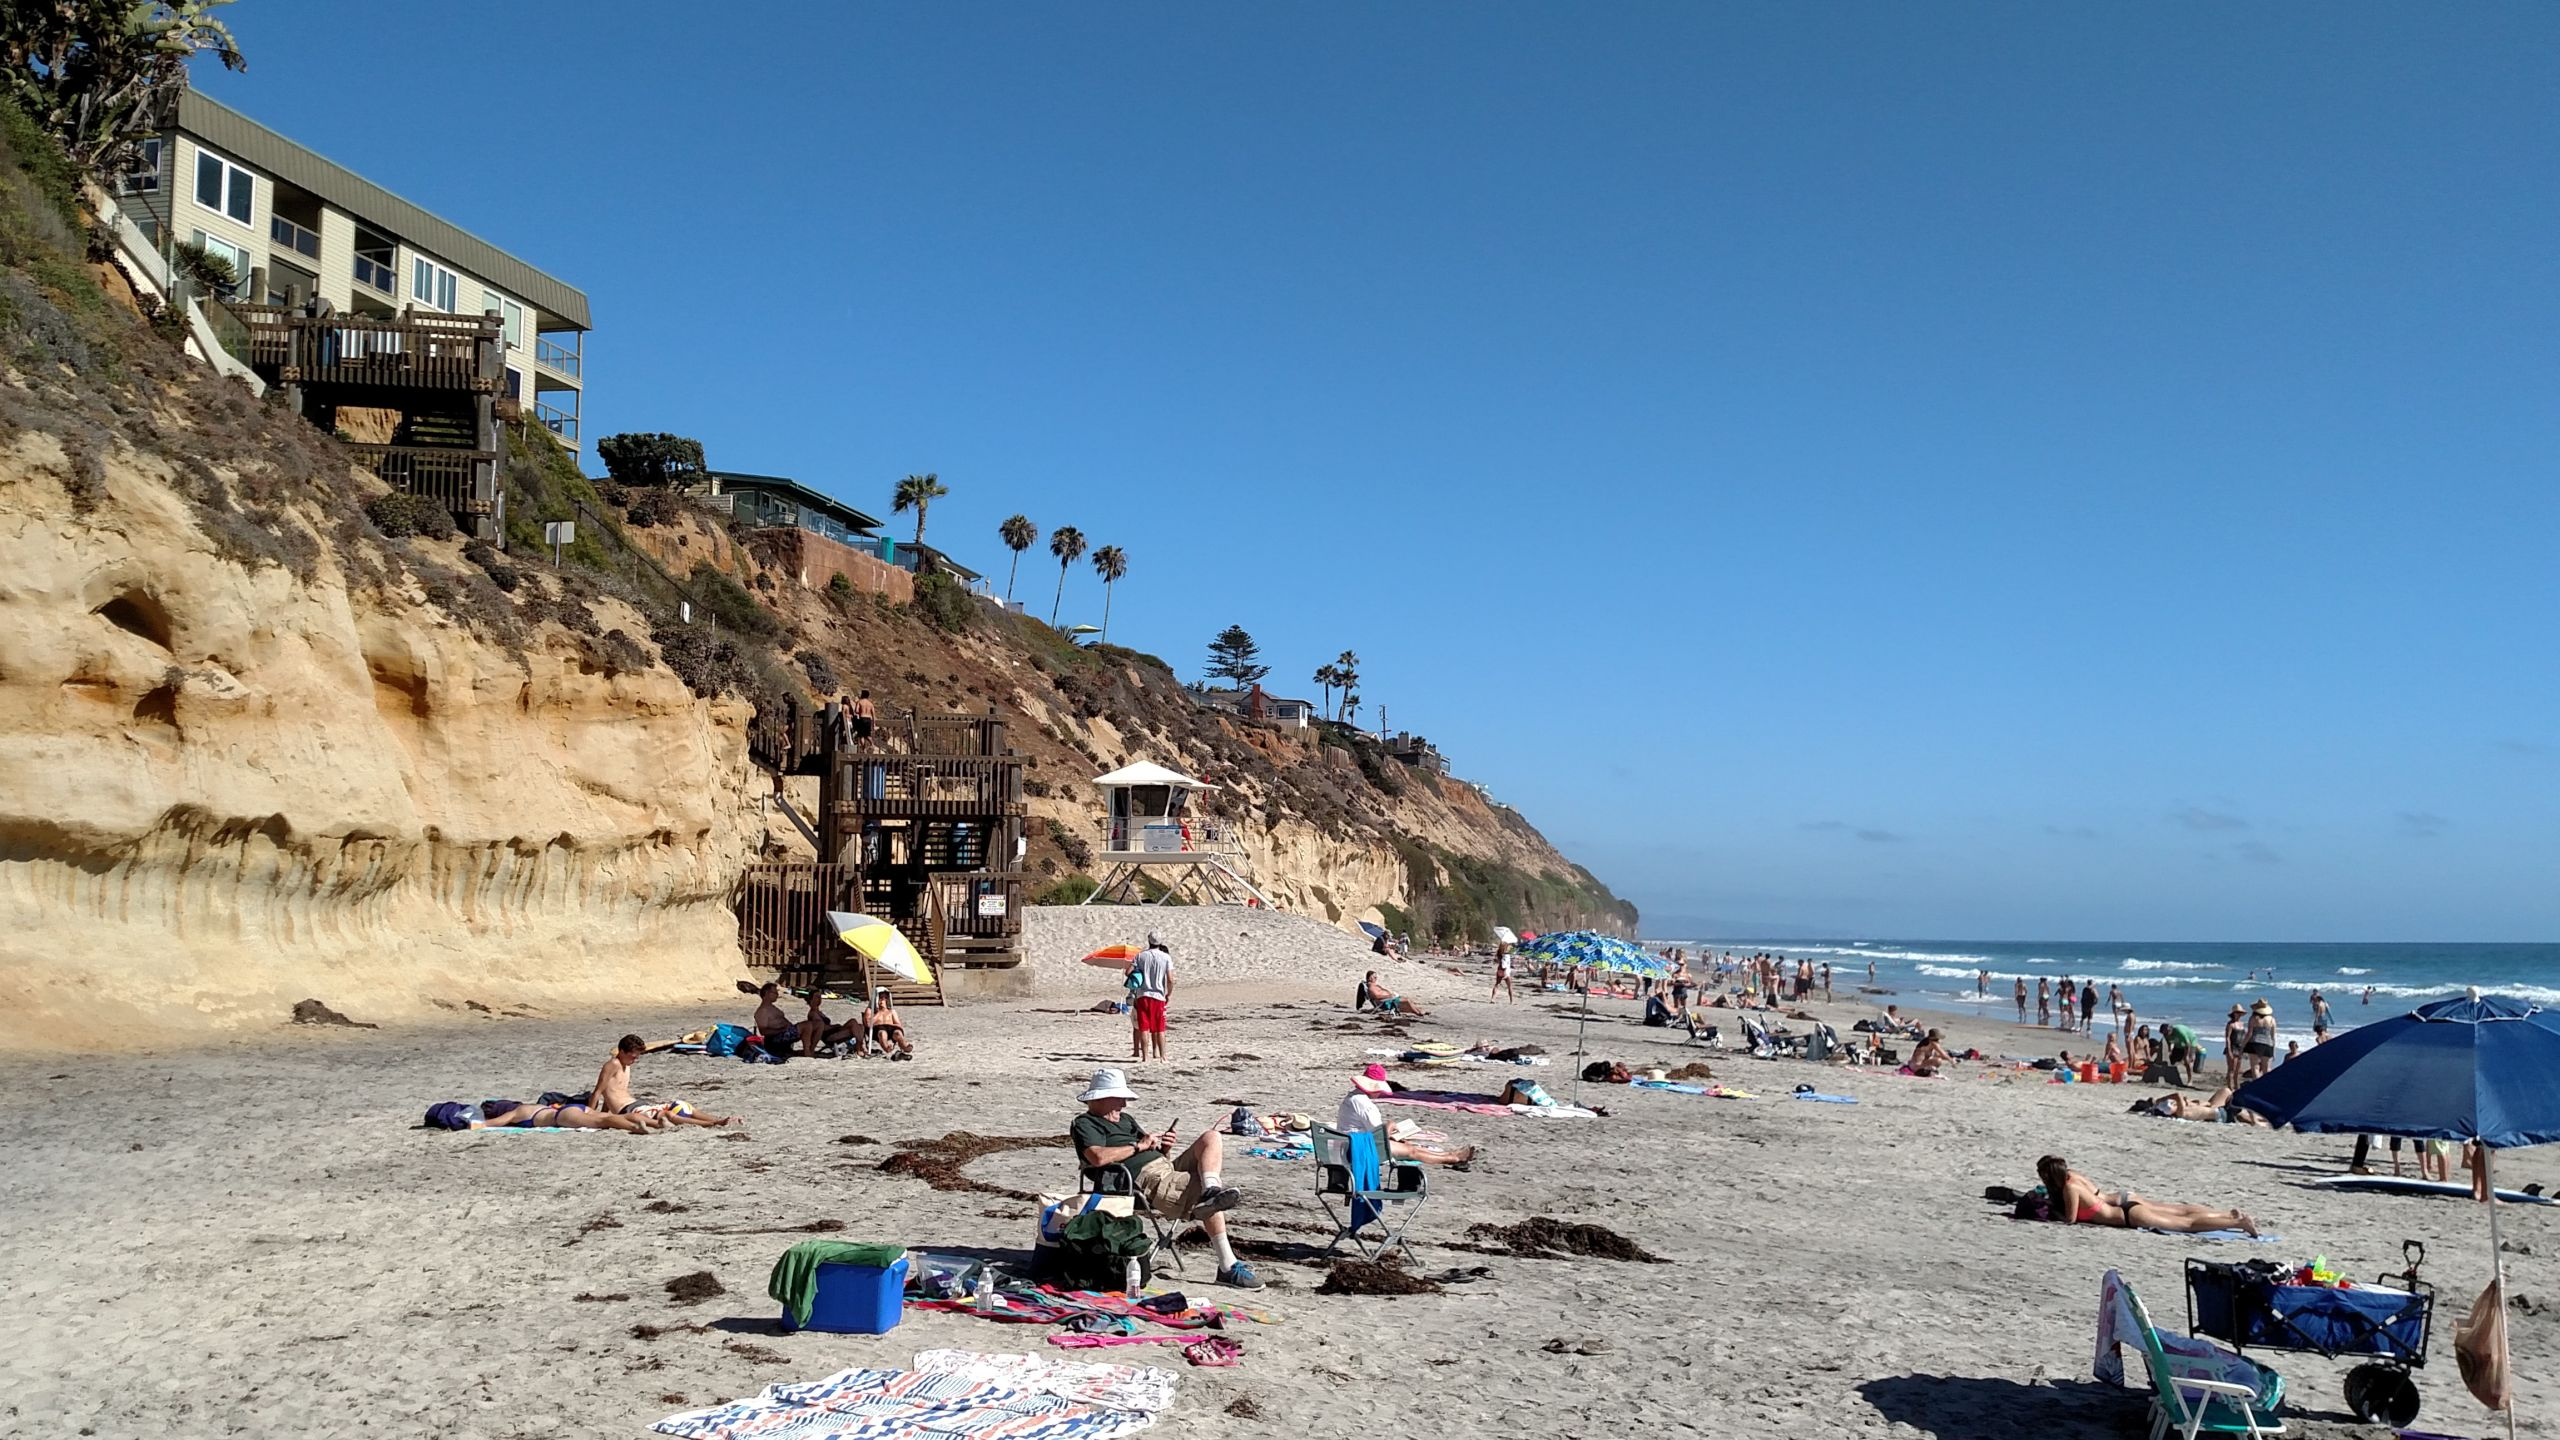 Encinitas Beaches and Bluff